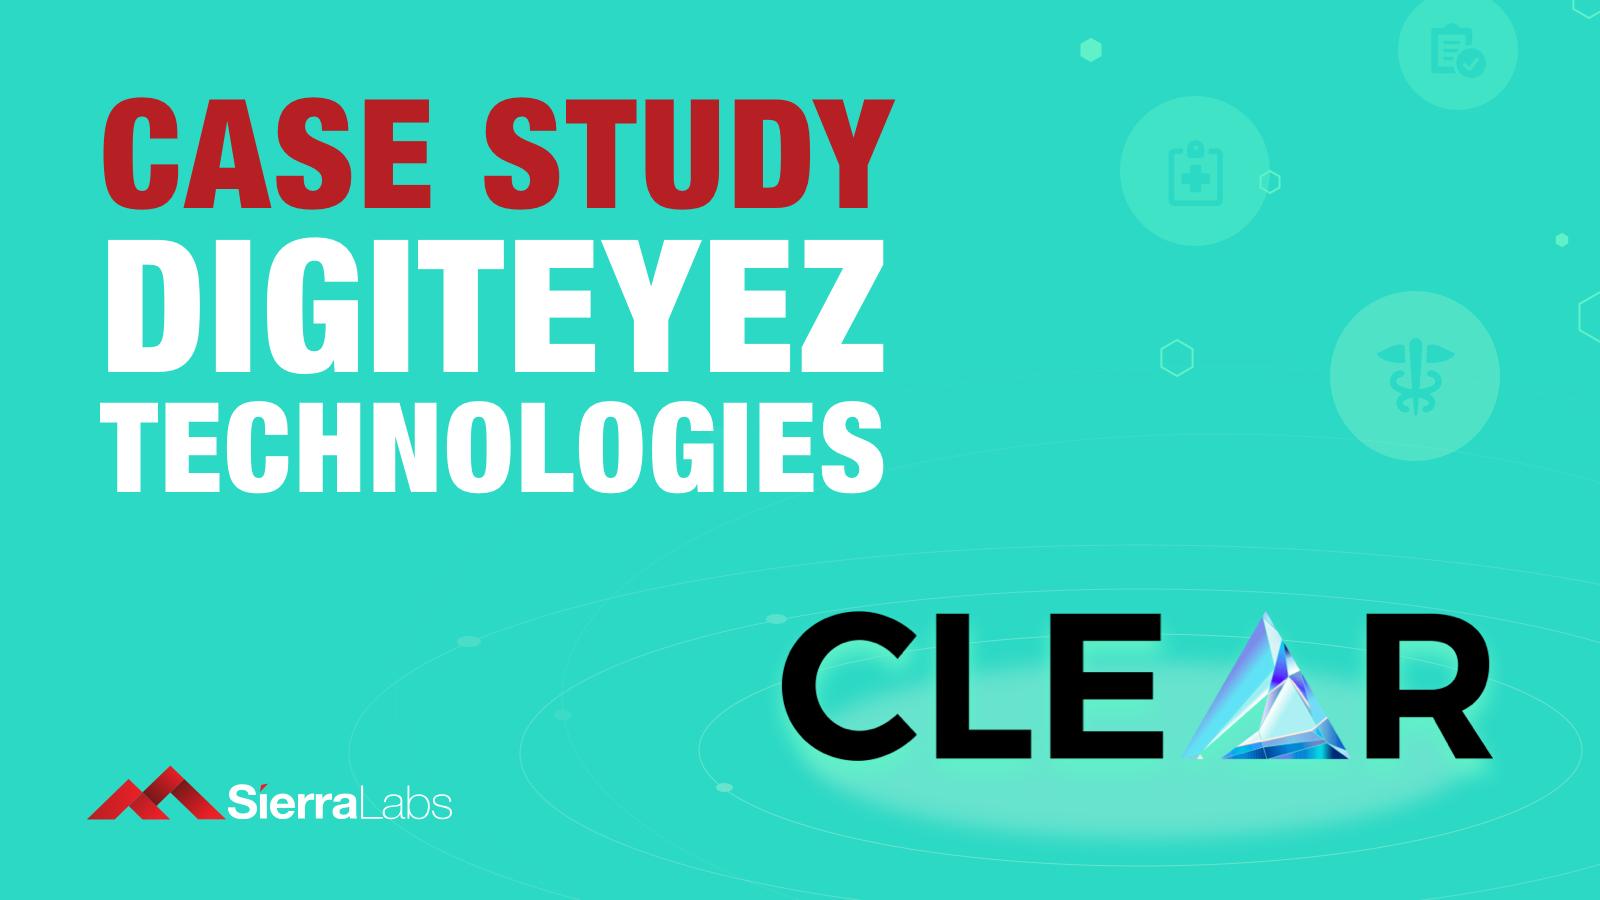 Case Study Digiteyez Technologies Clear